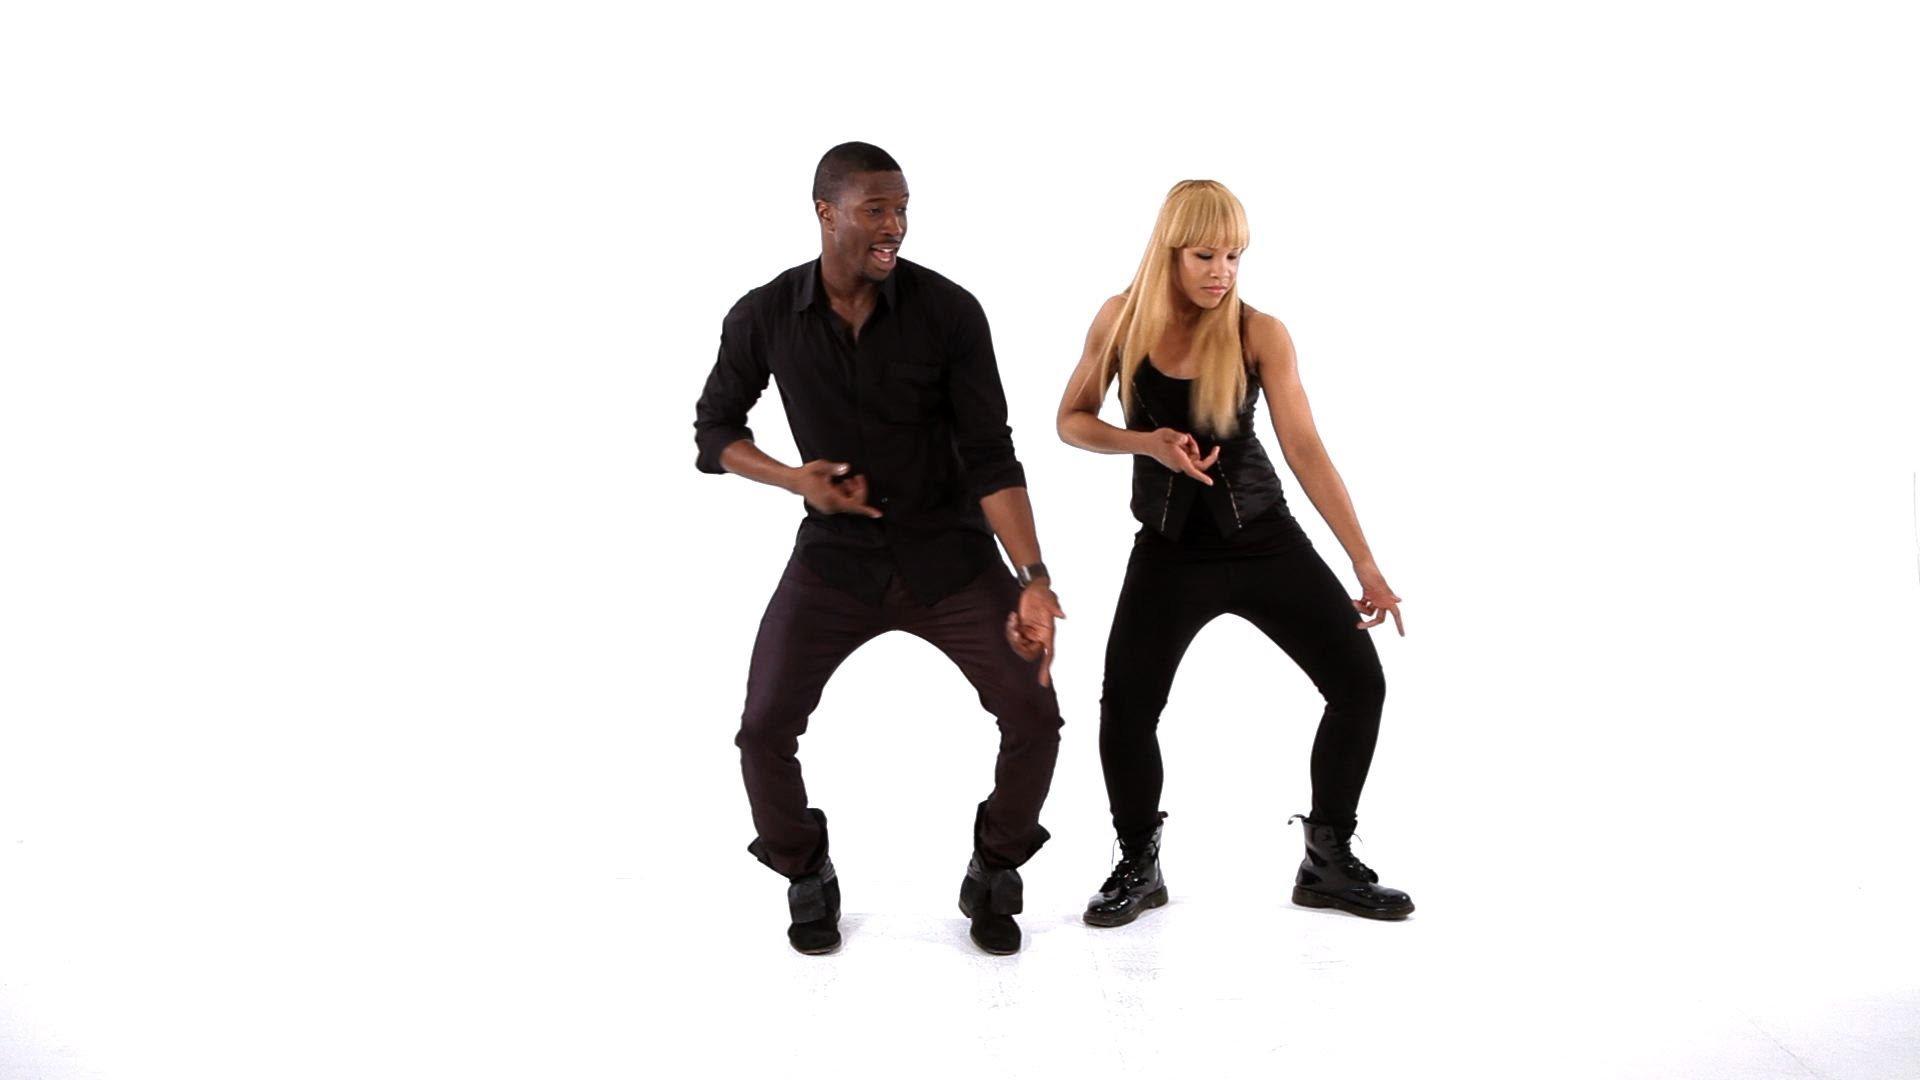 5 popular West African Dance Strokes